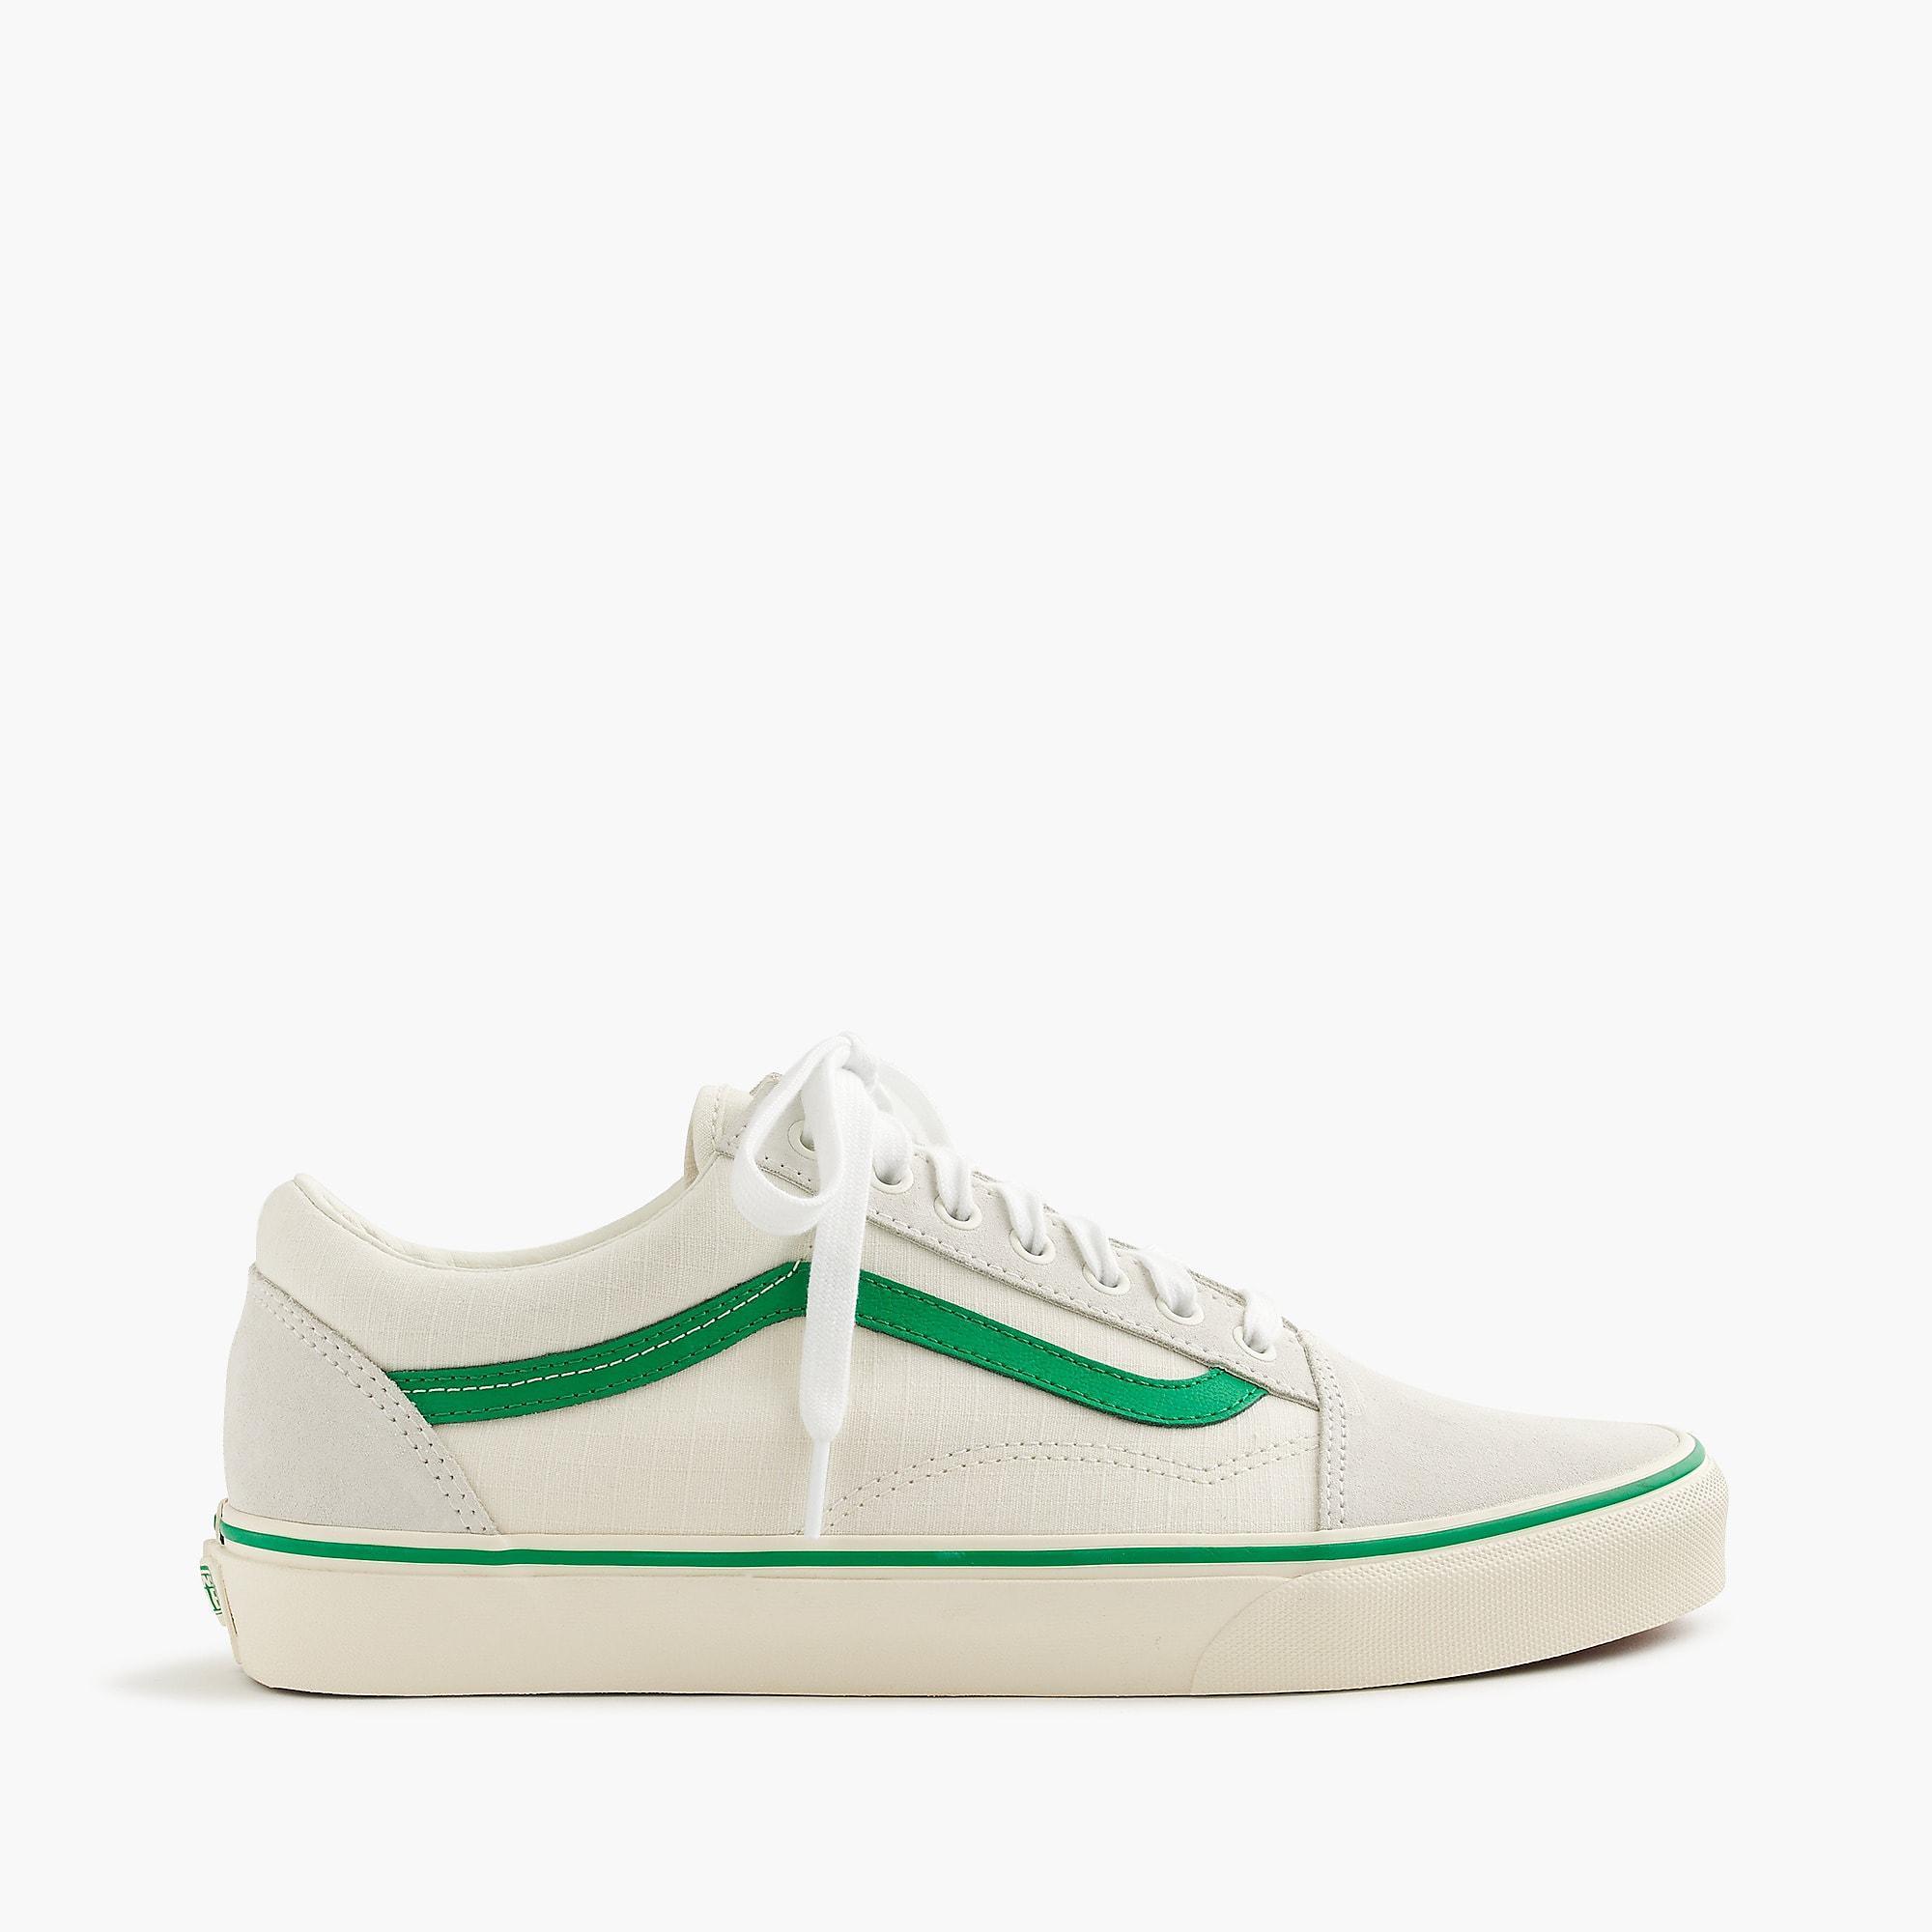 706ba0e659f5c7 Lyst - Vans Old Skool Sneakers In Ripstop Cotton in Green for Men